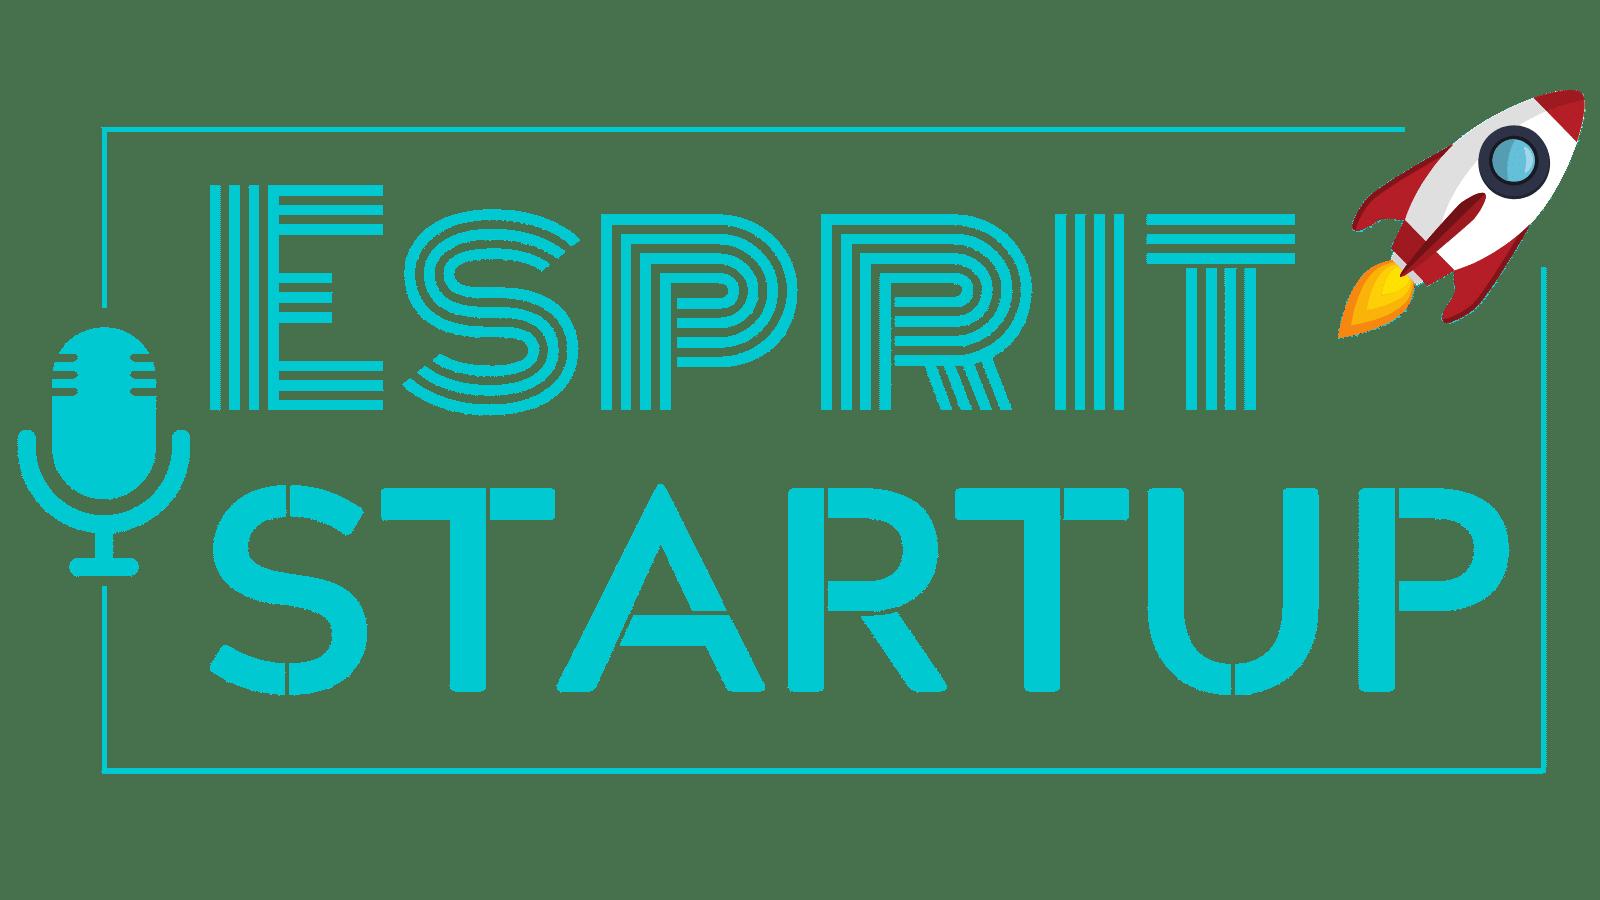 Podcast Esprit Startup